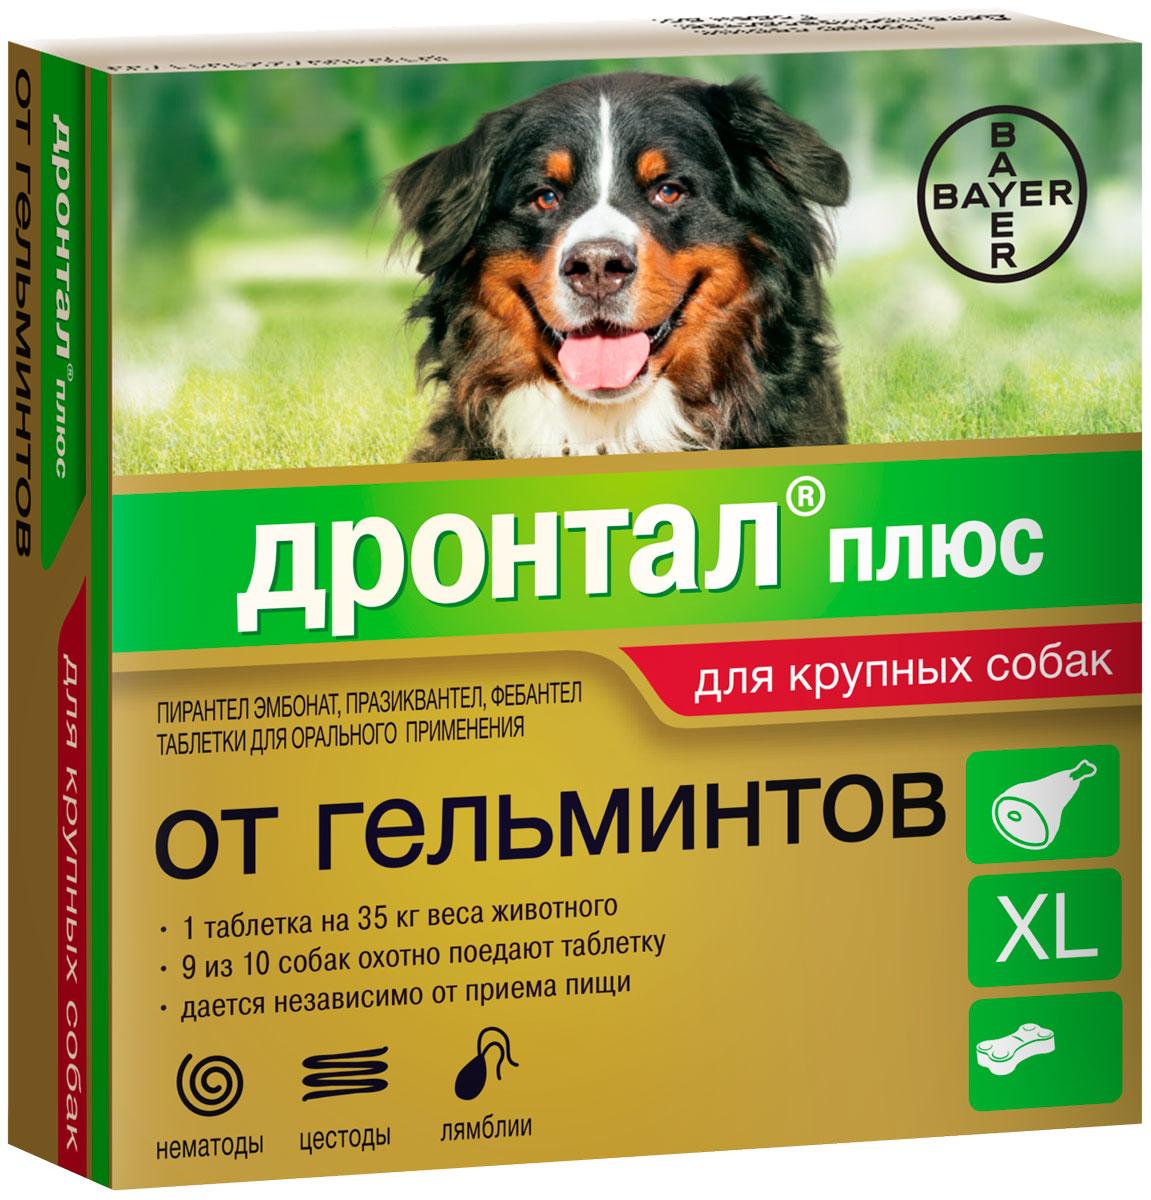 дронтал плюс Xl антигельминтик для собак крупных пород со вкусом мяса (1 таблетка)